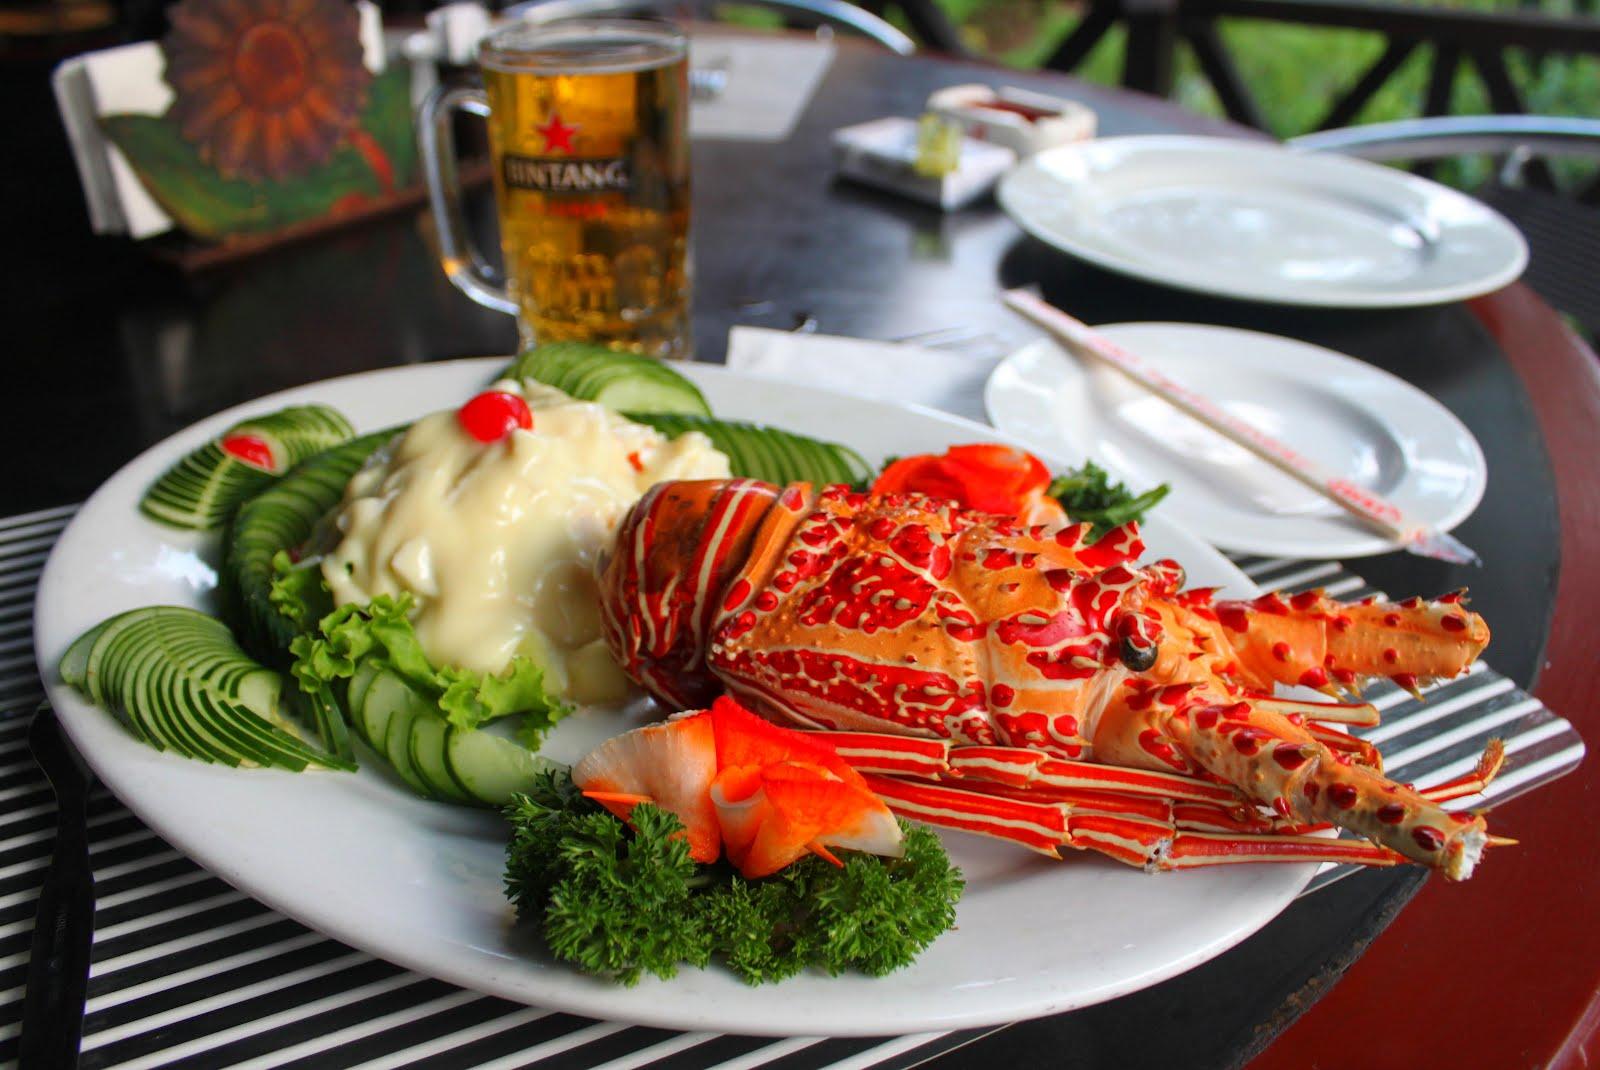 http://3.bp.blogspot.com/-oSOUVlxyASY/T4hTS6Sp9pI/AAAAAAAACK8/bR4c4VTFEpo/s1600/Lobster%2BLunch%2Bin%2BJakarta%2BIndonesia.jpg